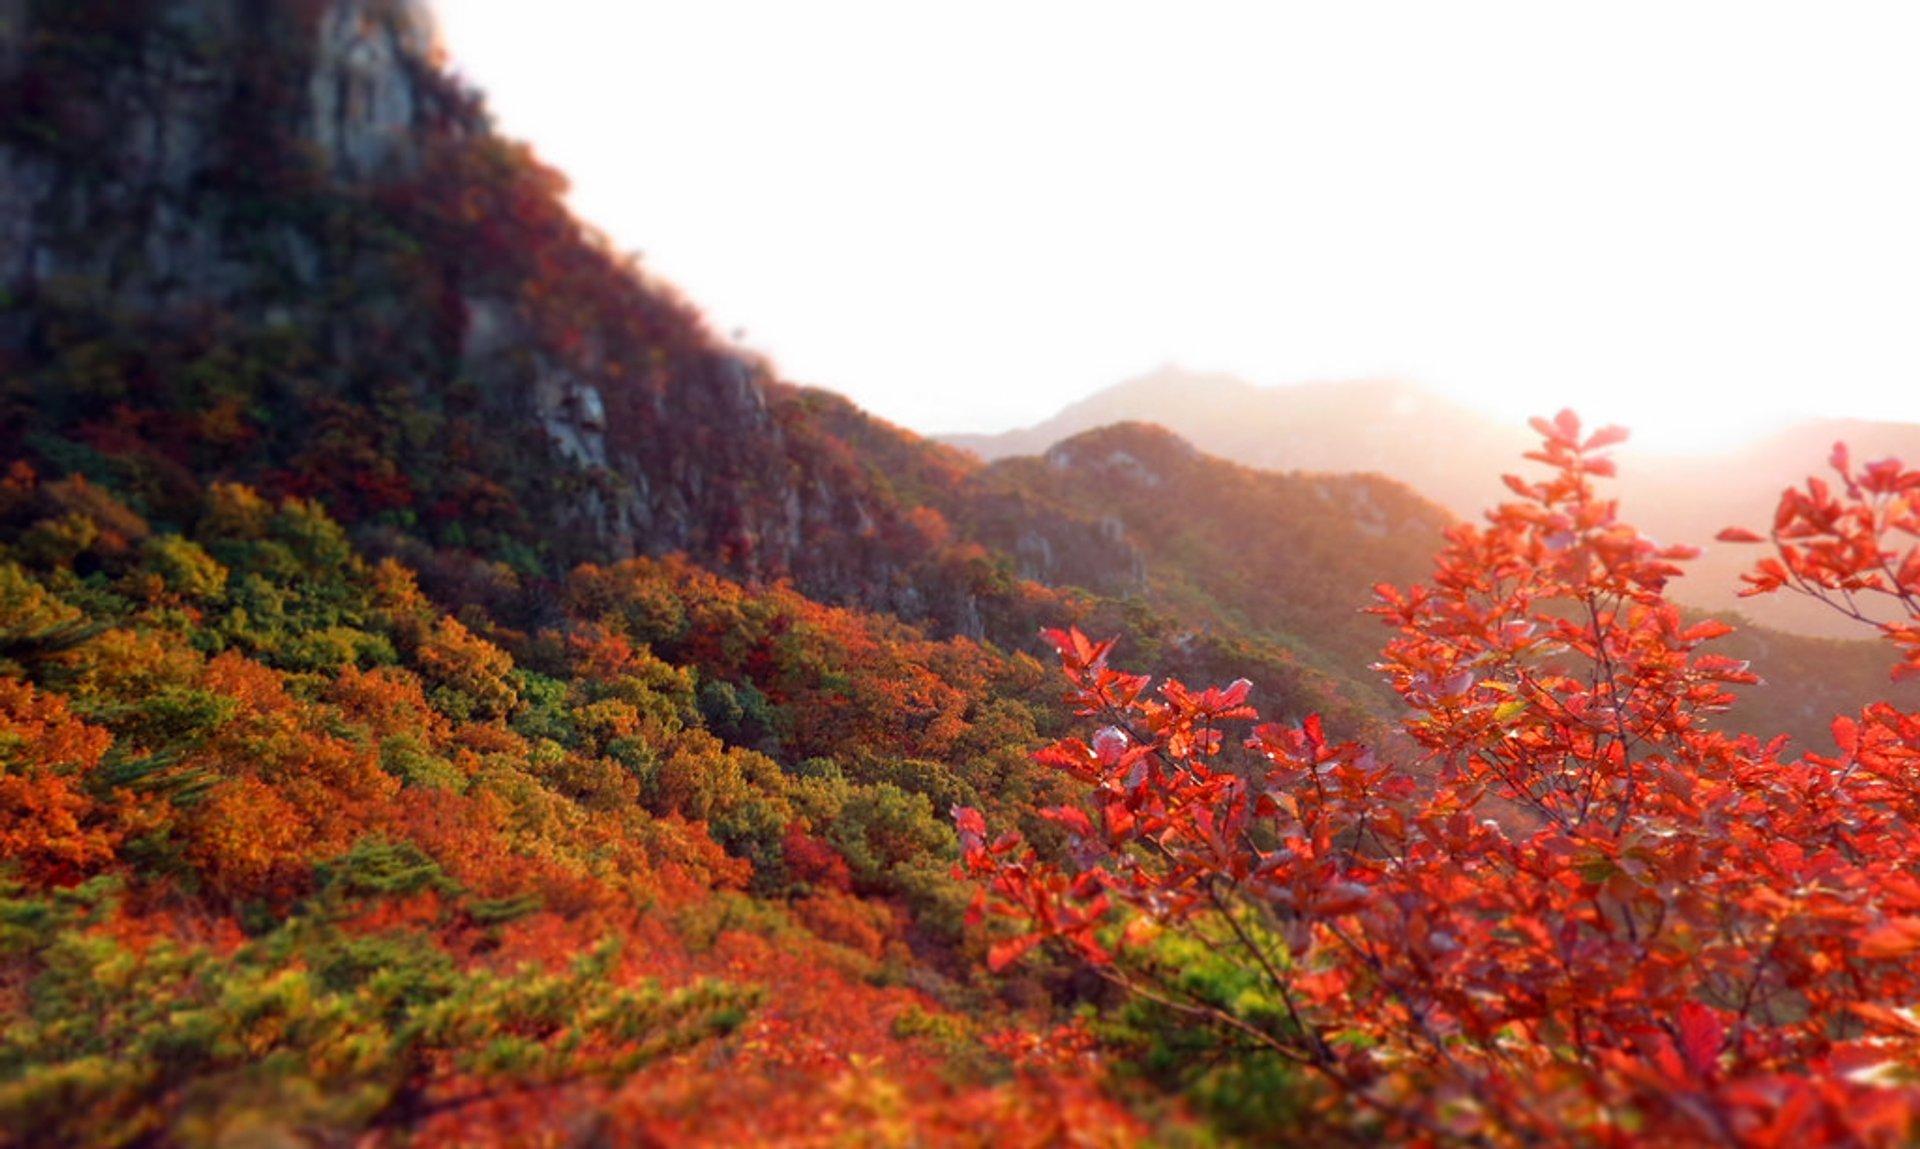 Autumn at Gwanaksan (Seoul, Korea) 2019